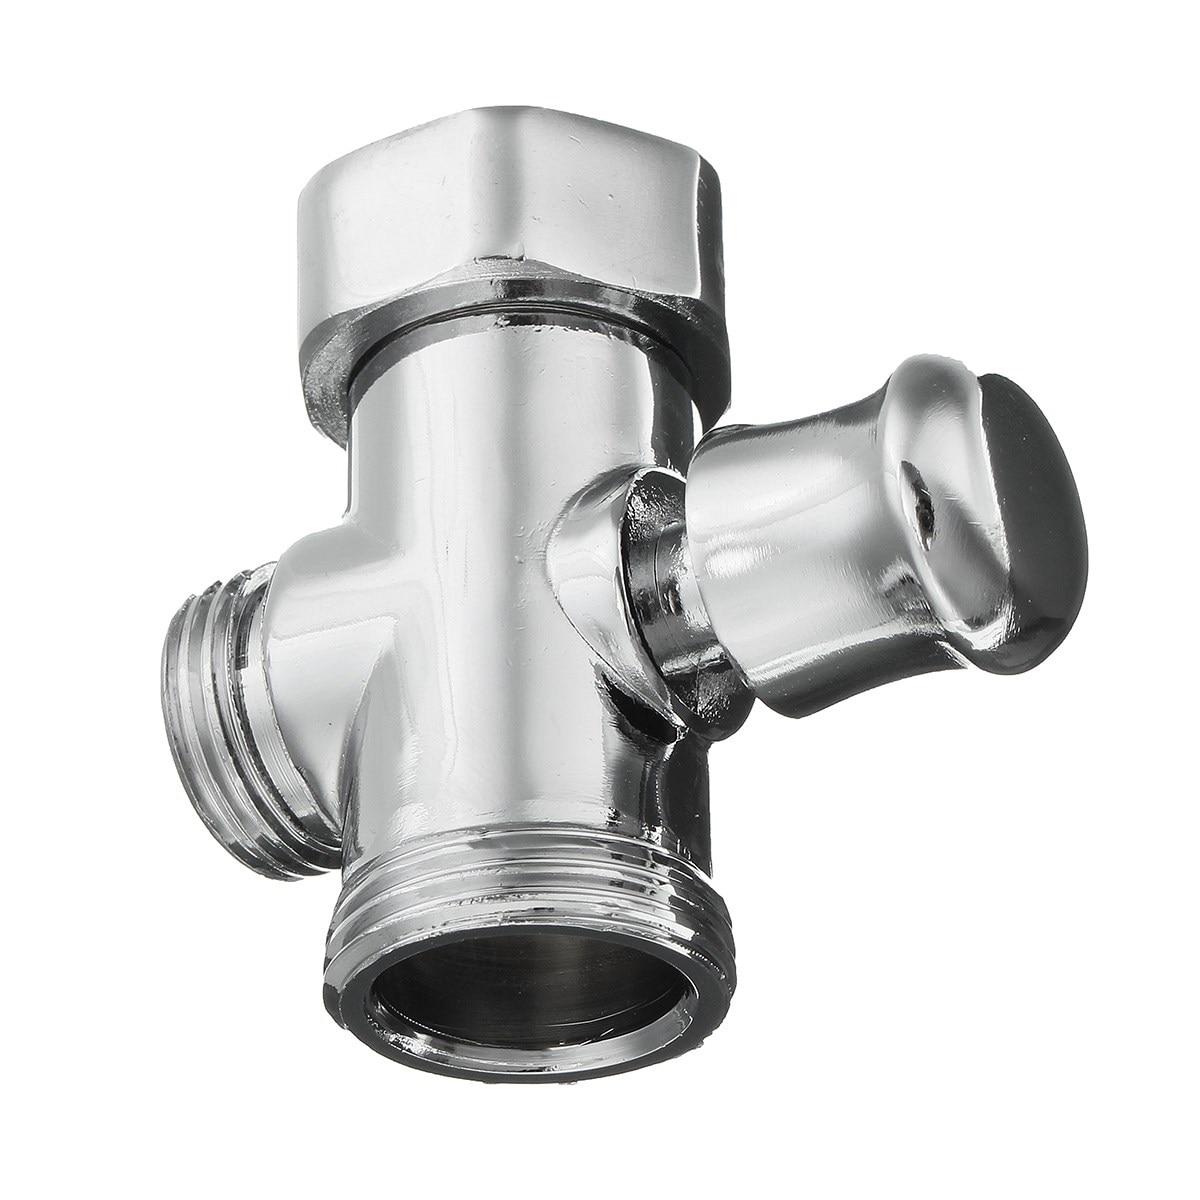 Inline Shower Diverter Wiring Diagrams Valve Diagram Faucet 3 Way Head 4 1 2 Bsp Tee Stem